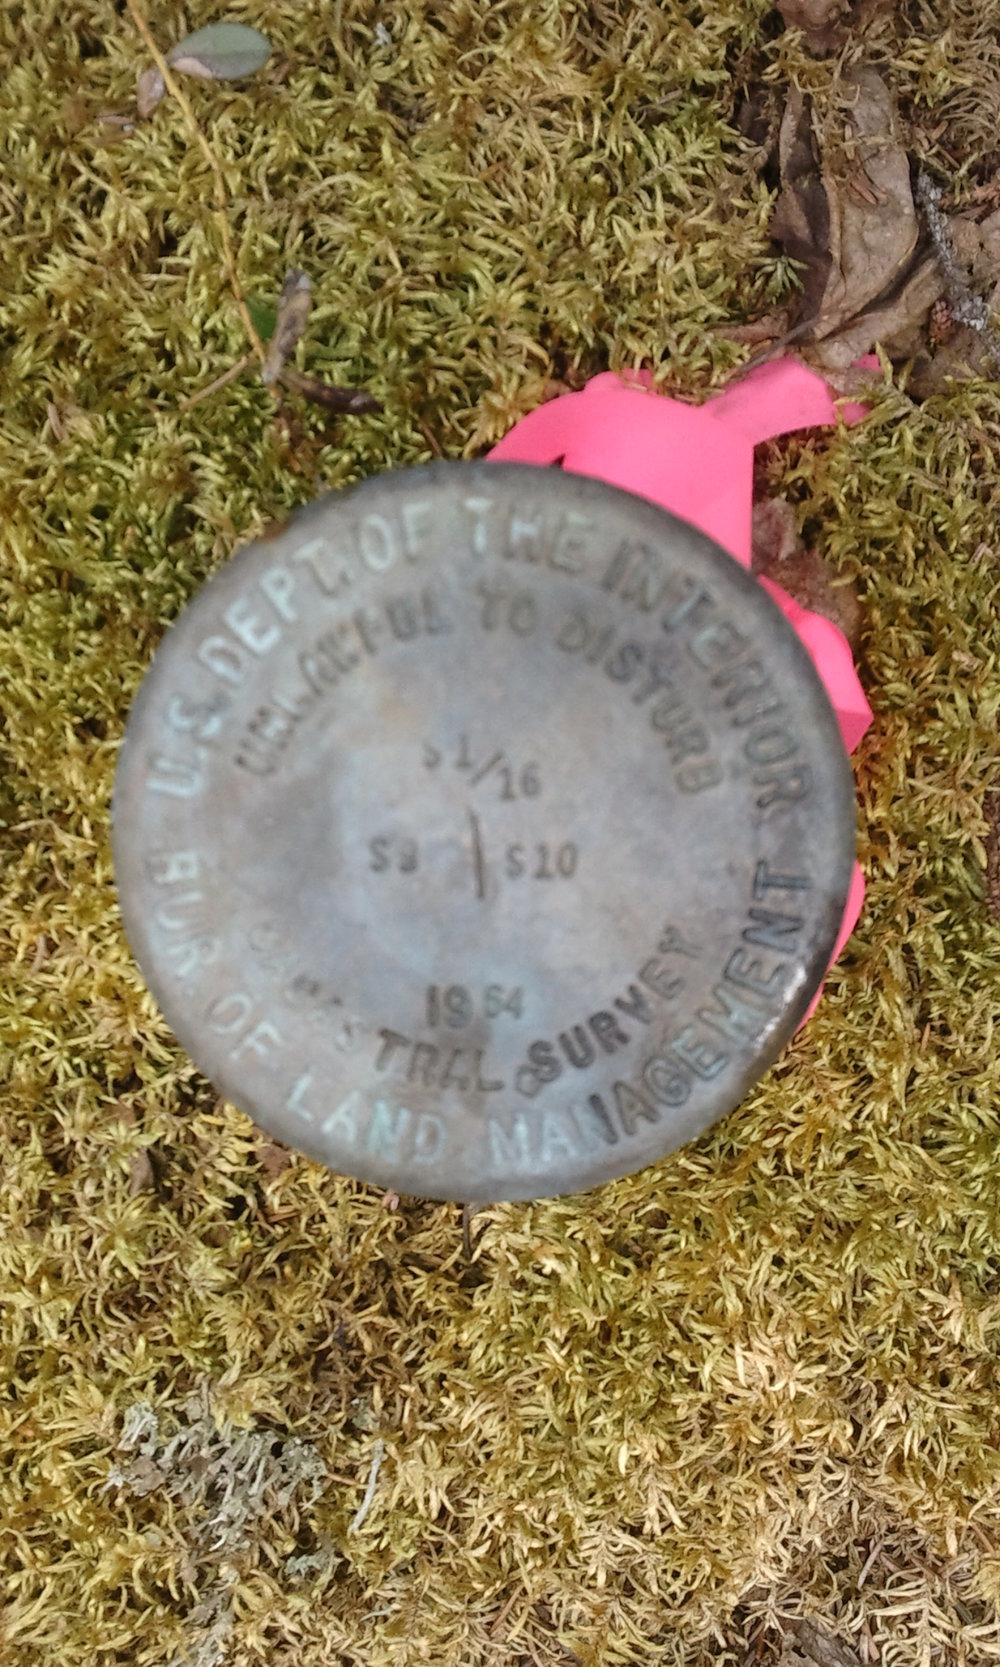 1952 BLM Sixteenth Corner Monument.